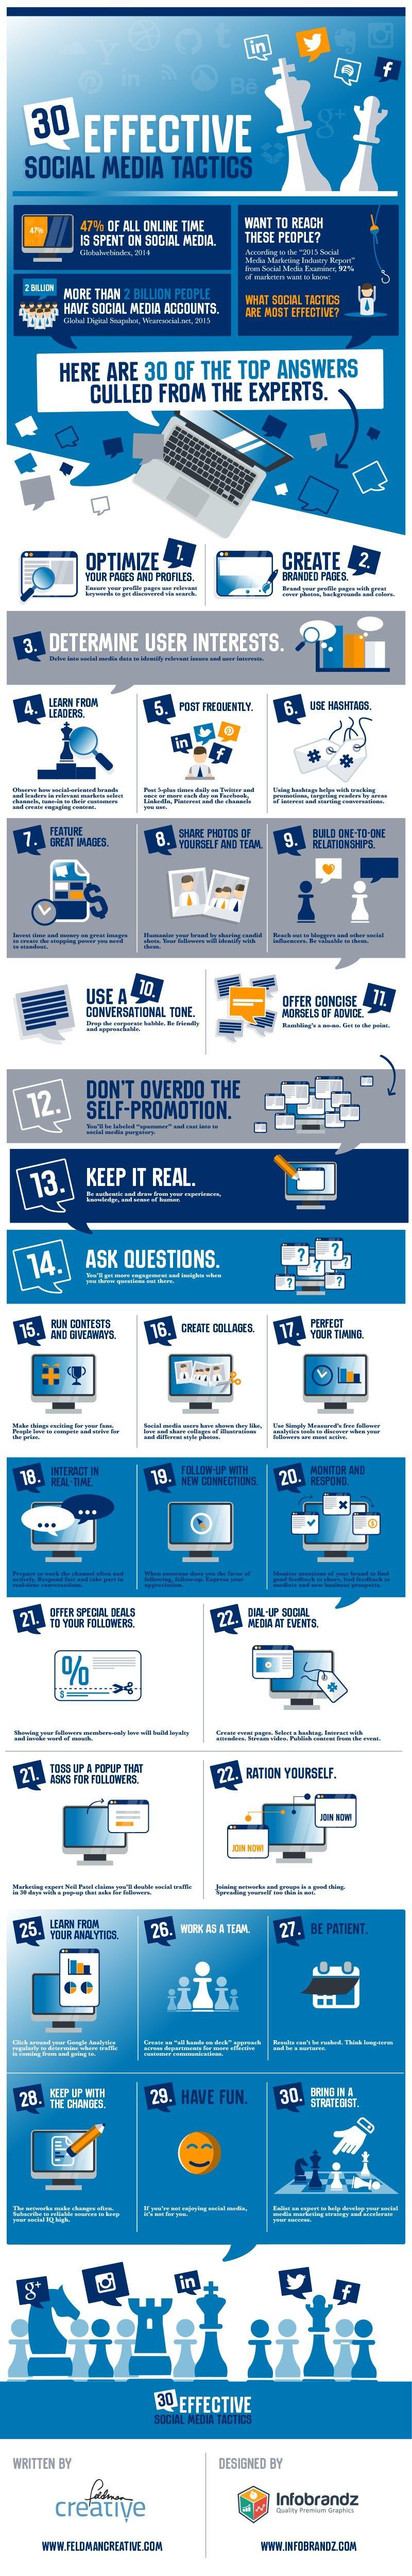 30 effective real estate social media marketing tactics to work smarter infographic